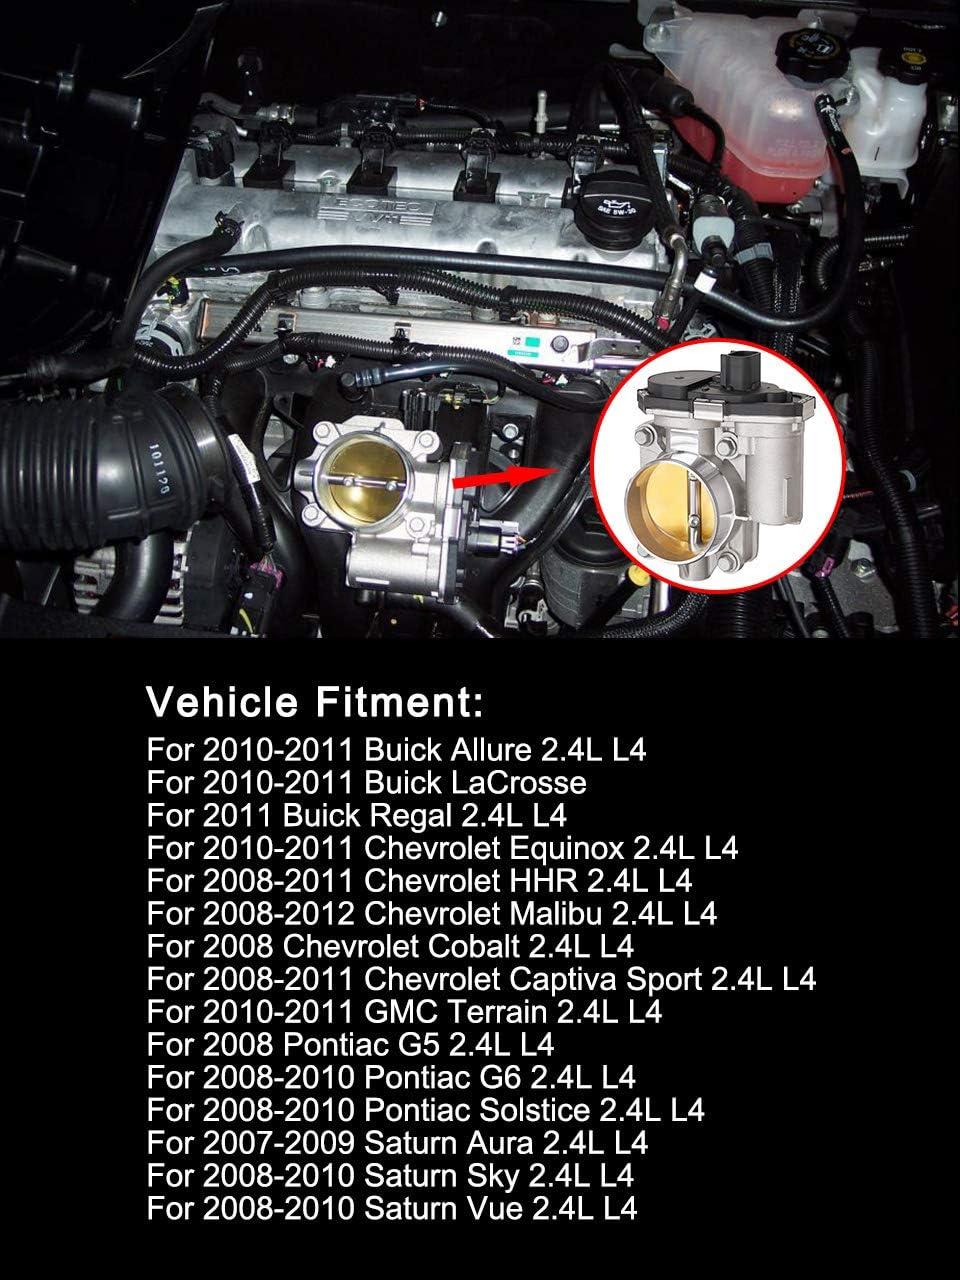 12631186 Throttle Body For Chevrolet Equinox Malibu Cobalt HHR Saturn Vue Aura Pontiac G5 G6 2.4L